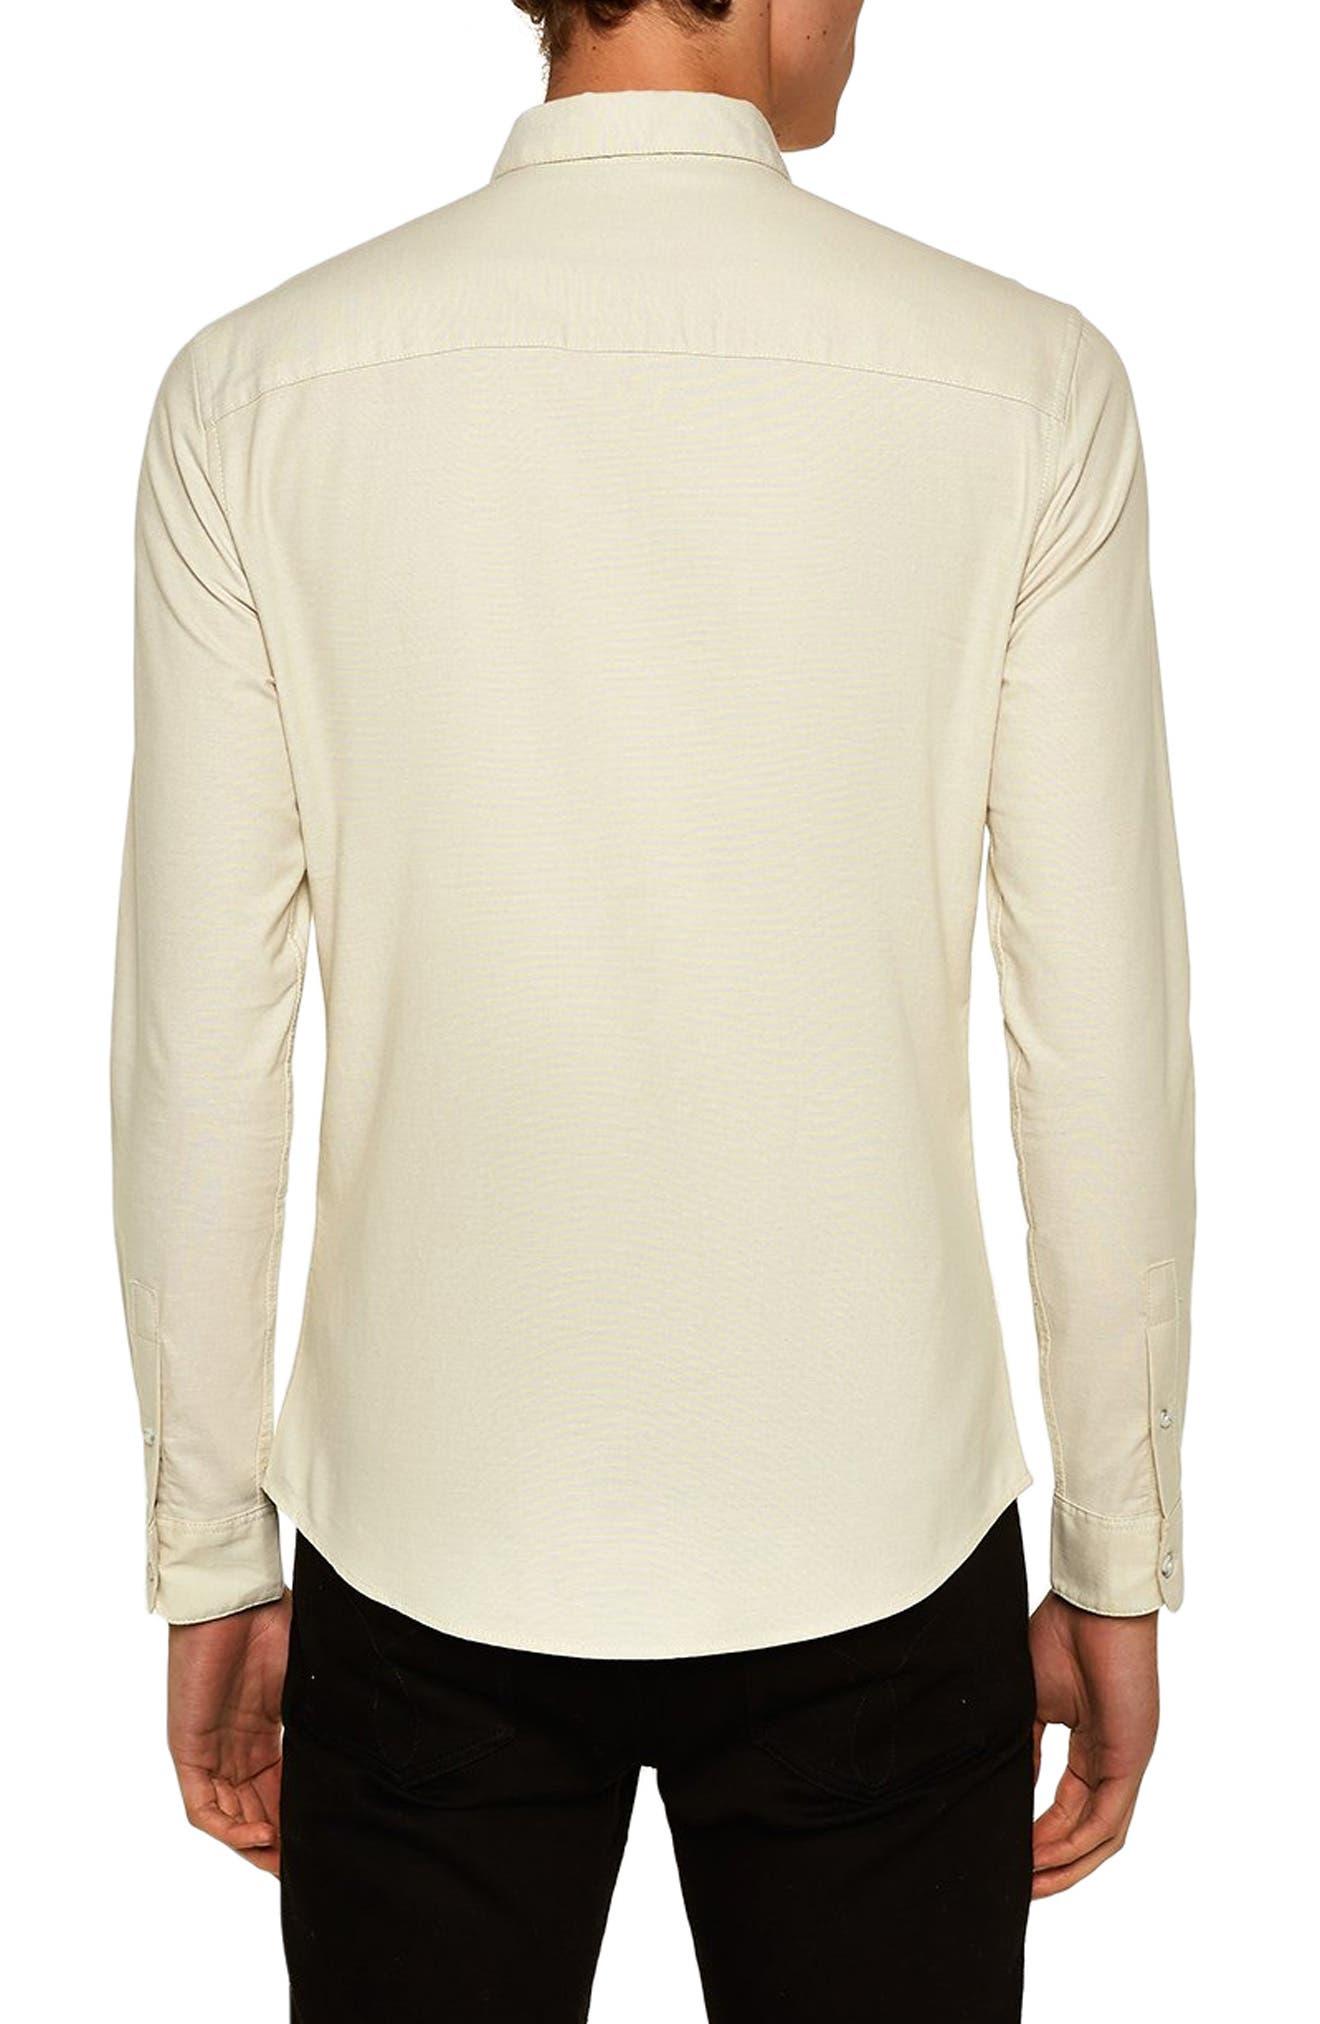 TOPMAN,                             Muscle Fit Stripe Oxford Shirt,                             Alternate thumbnail 3, color,                             250